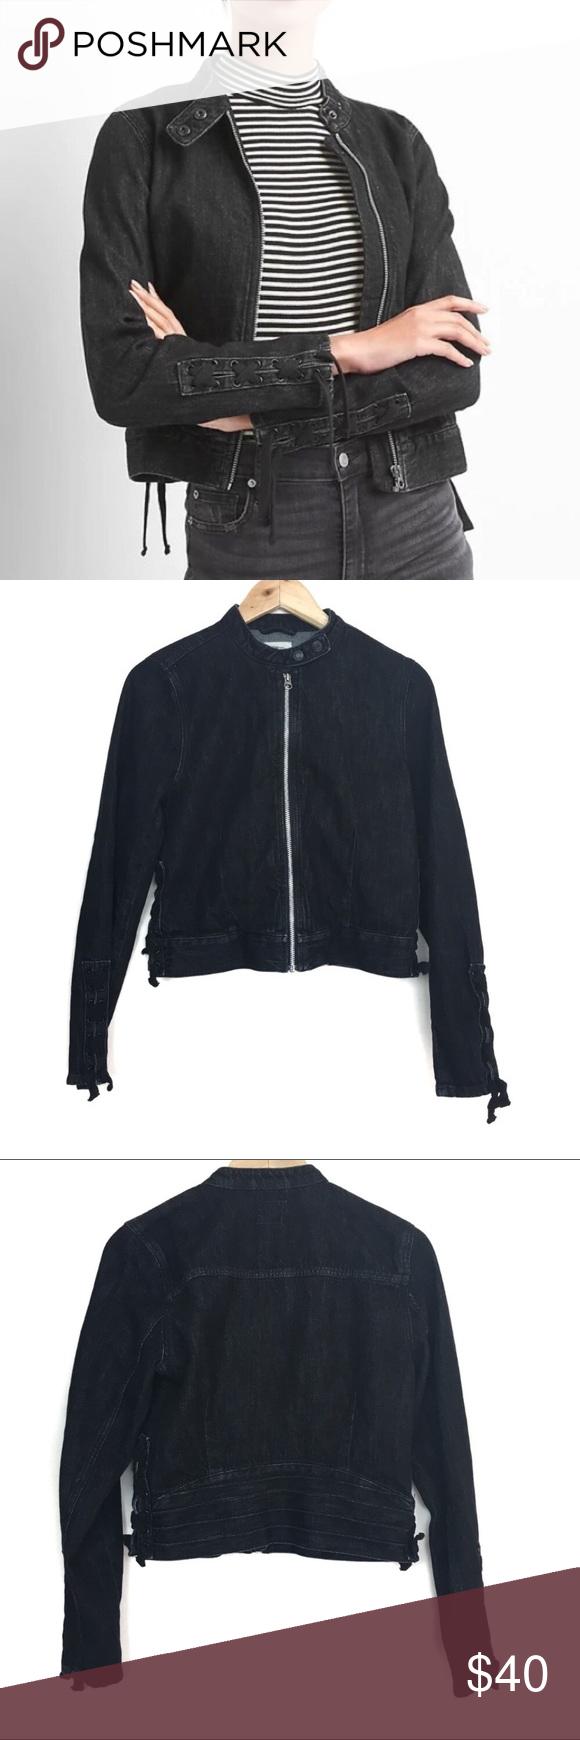 Gap Black Lace Up Moto Denim Jacket Fashion Clothes Design Fashion Design